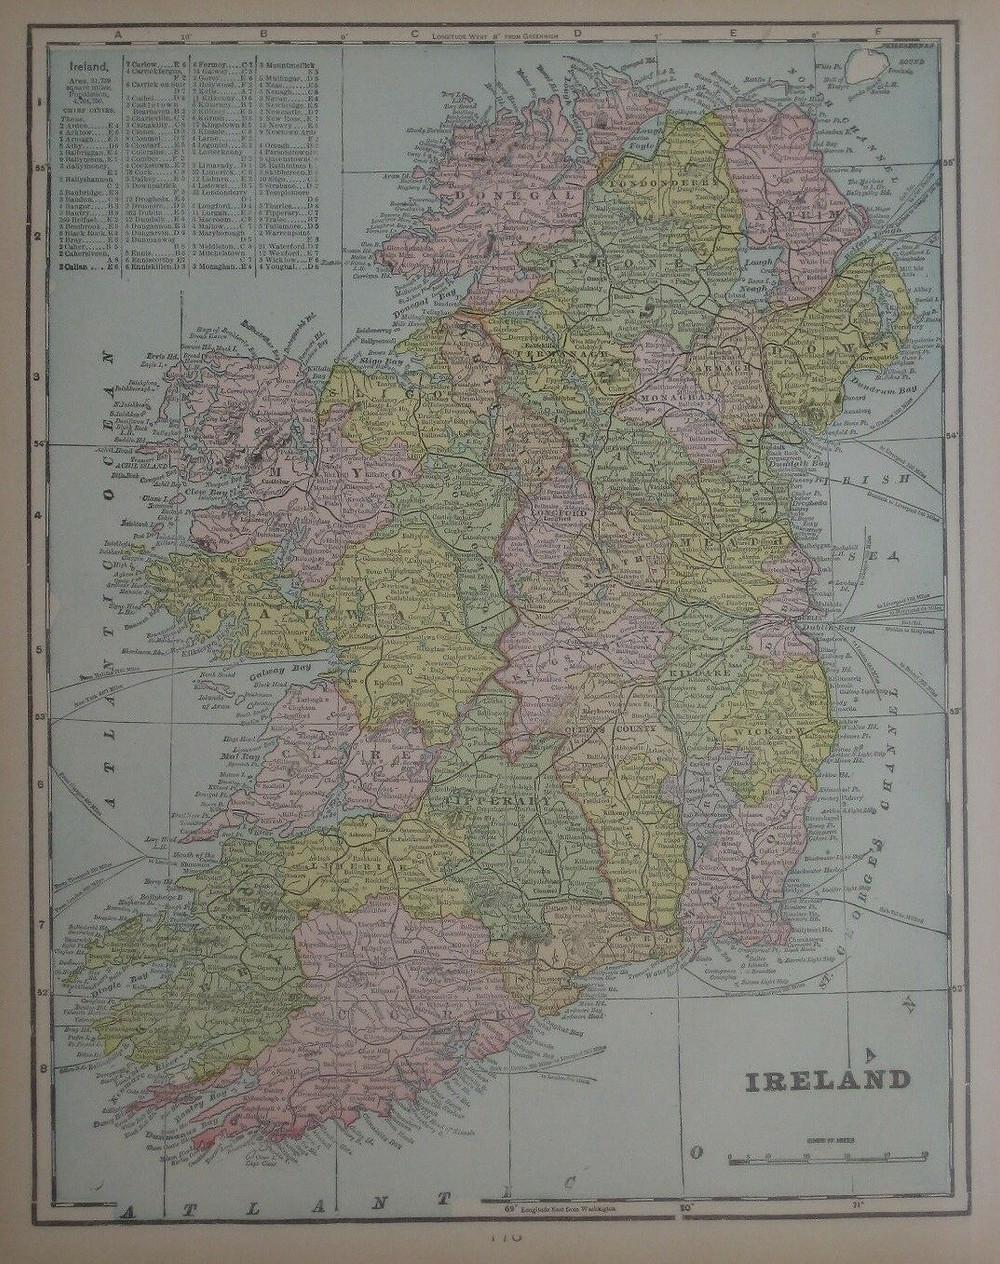 Original 1900 map of Ireland, the third-largest island in Europe